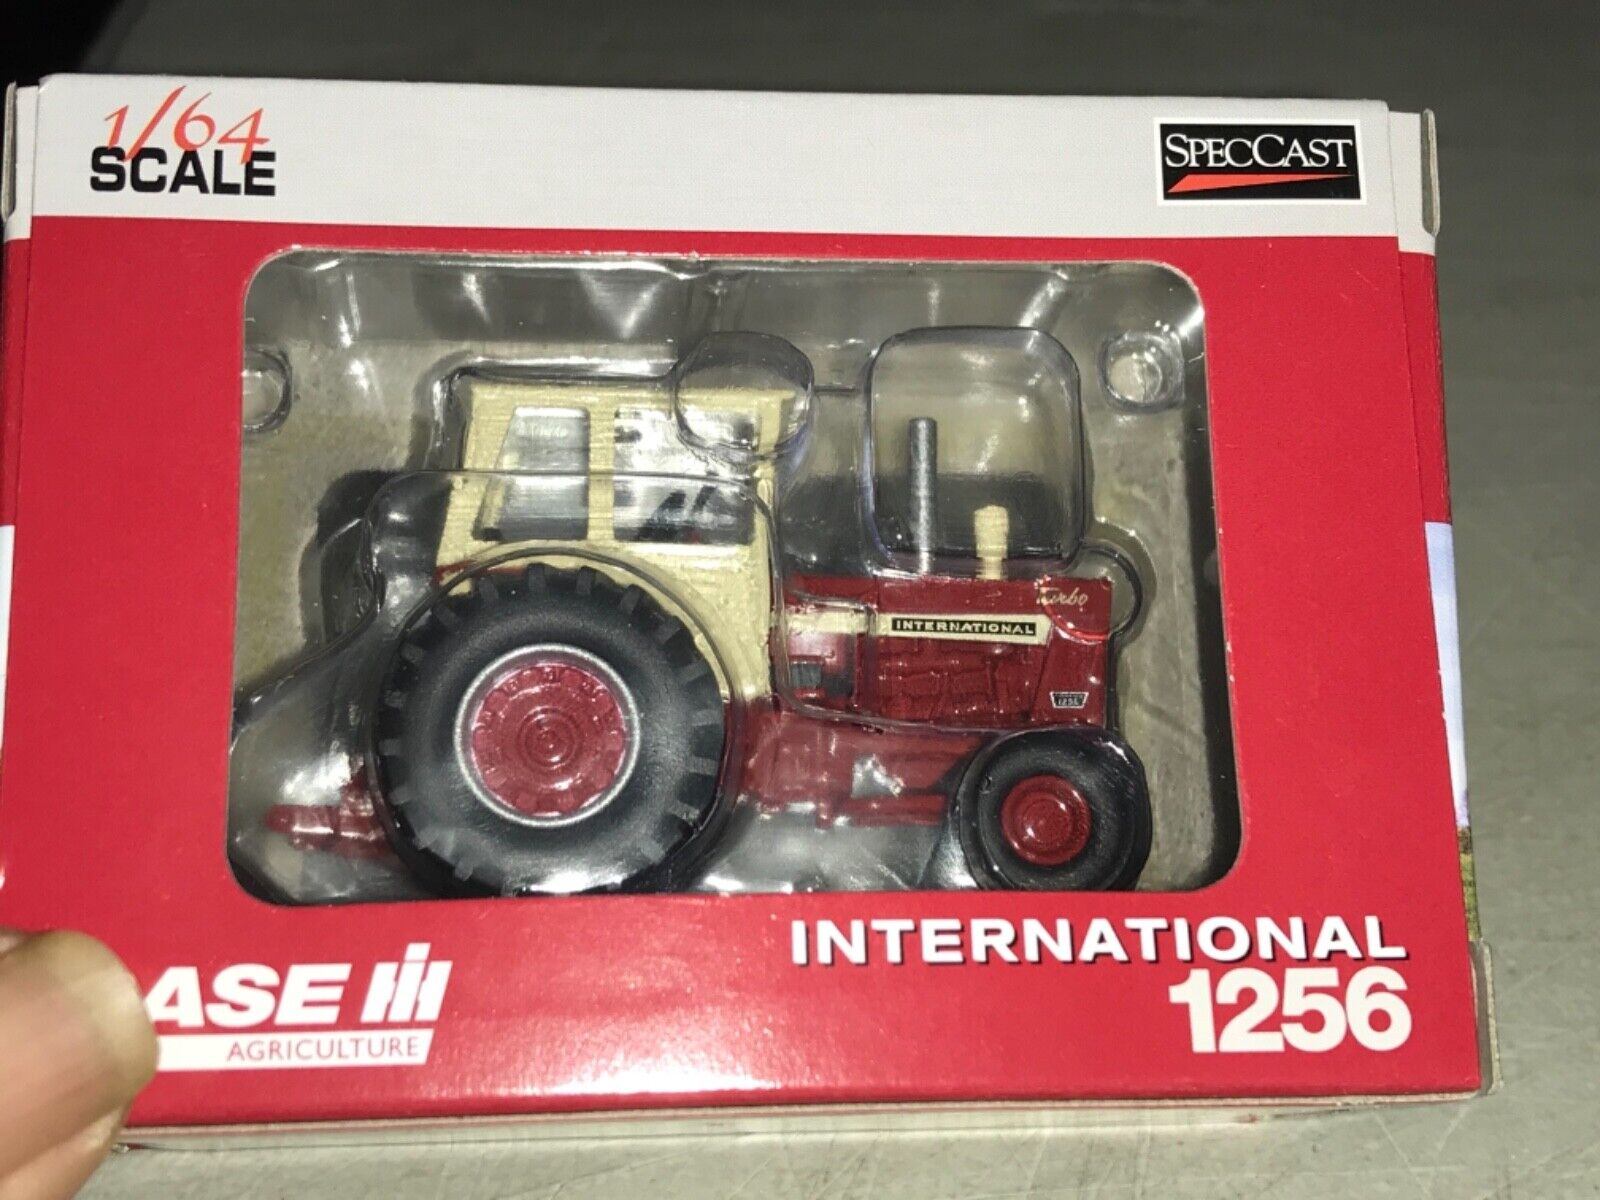 New SpecCast Case International Farmall 1256 Tractor 1:64 Scale 50 Years